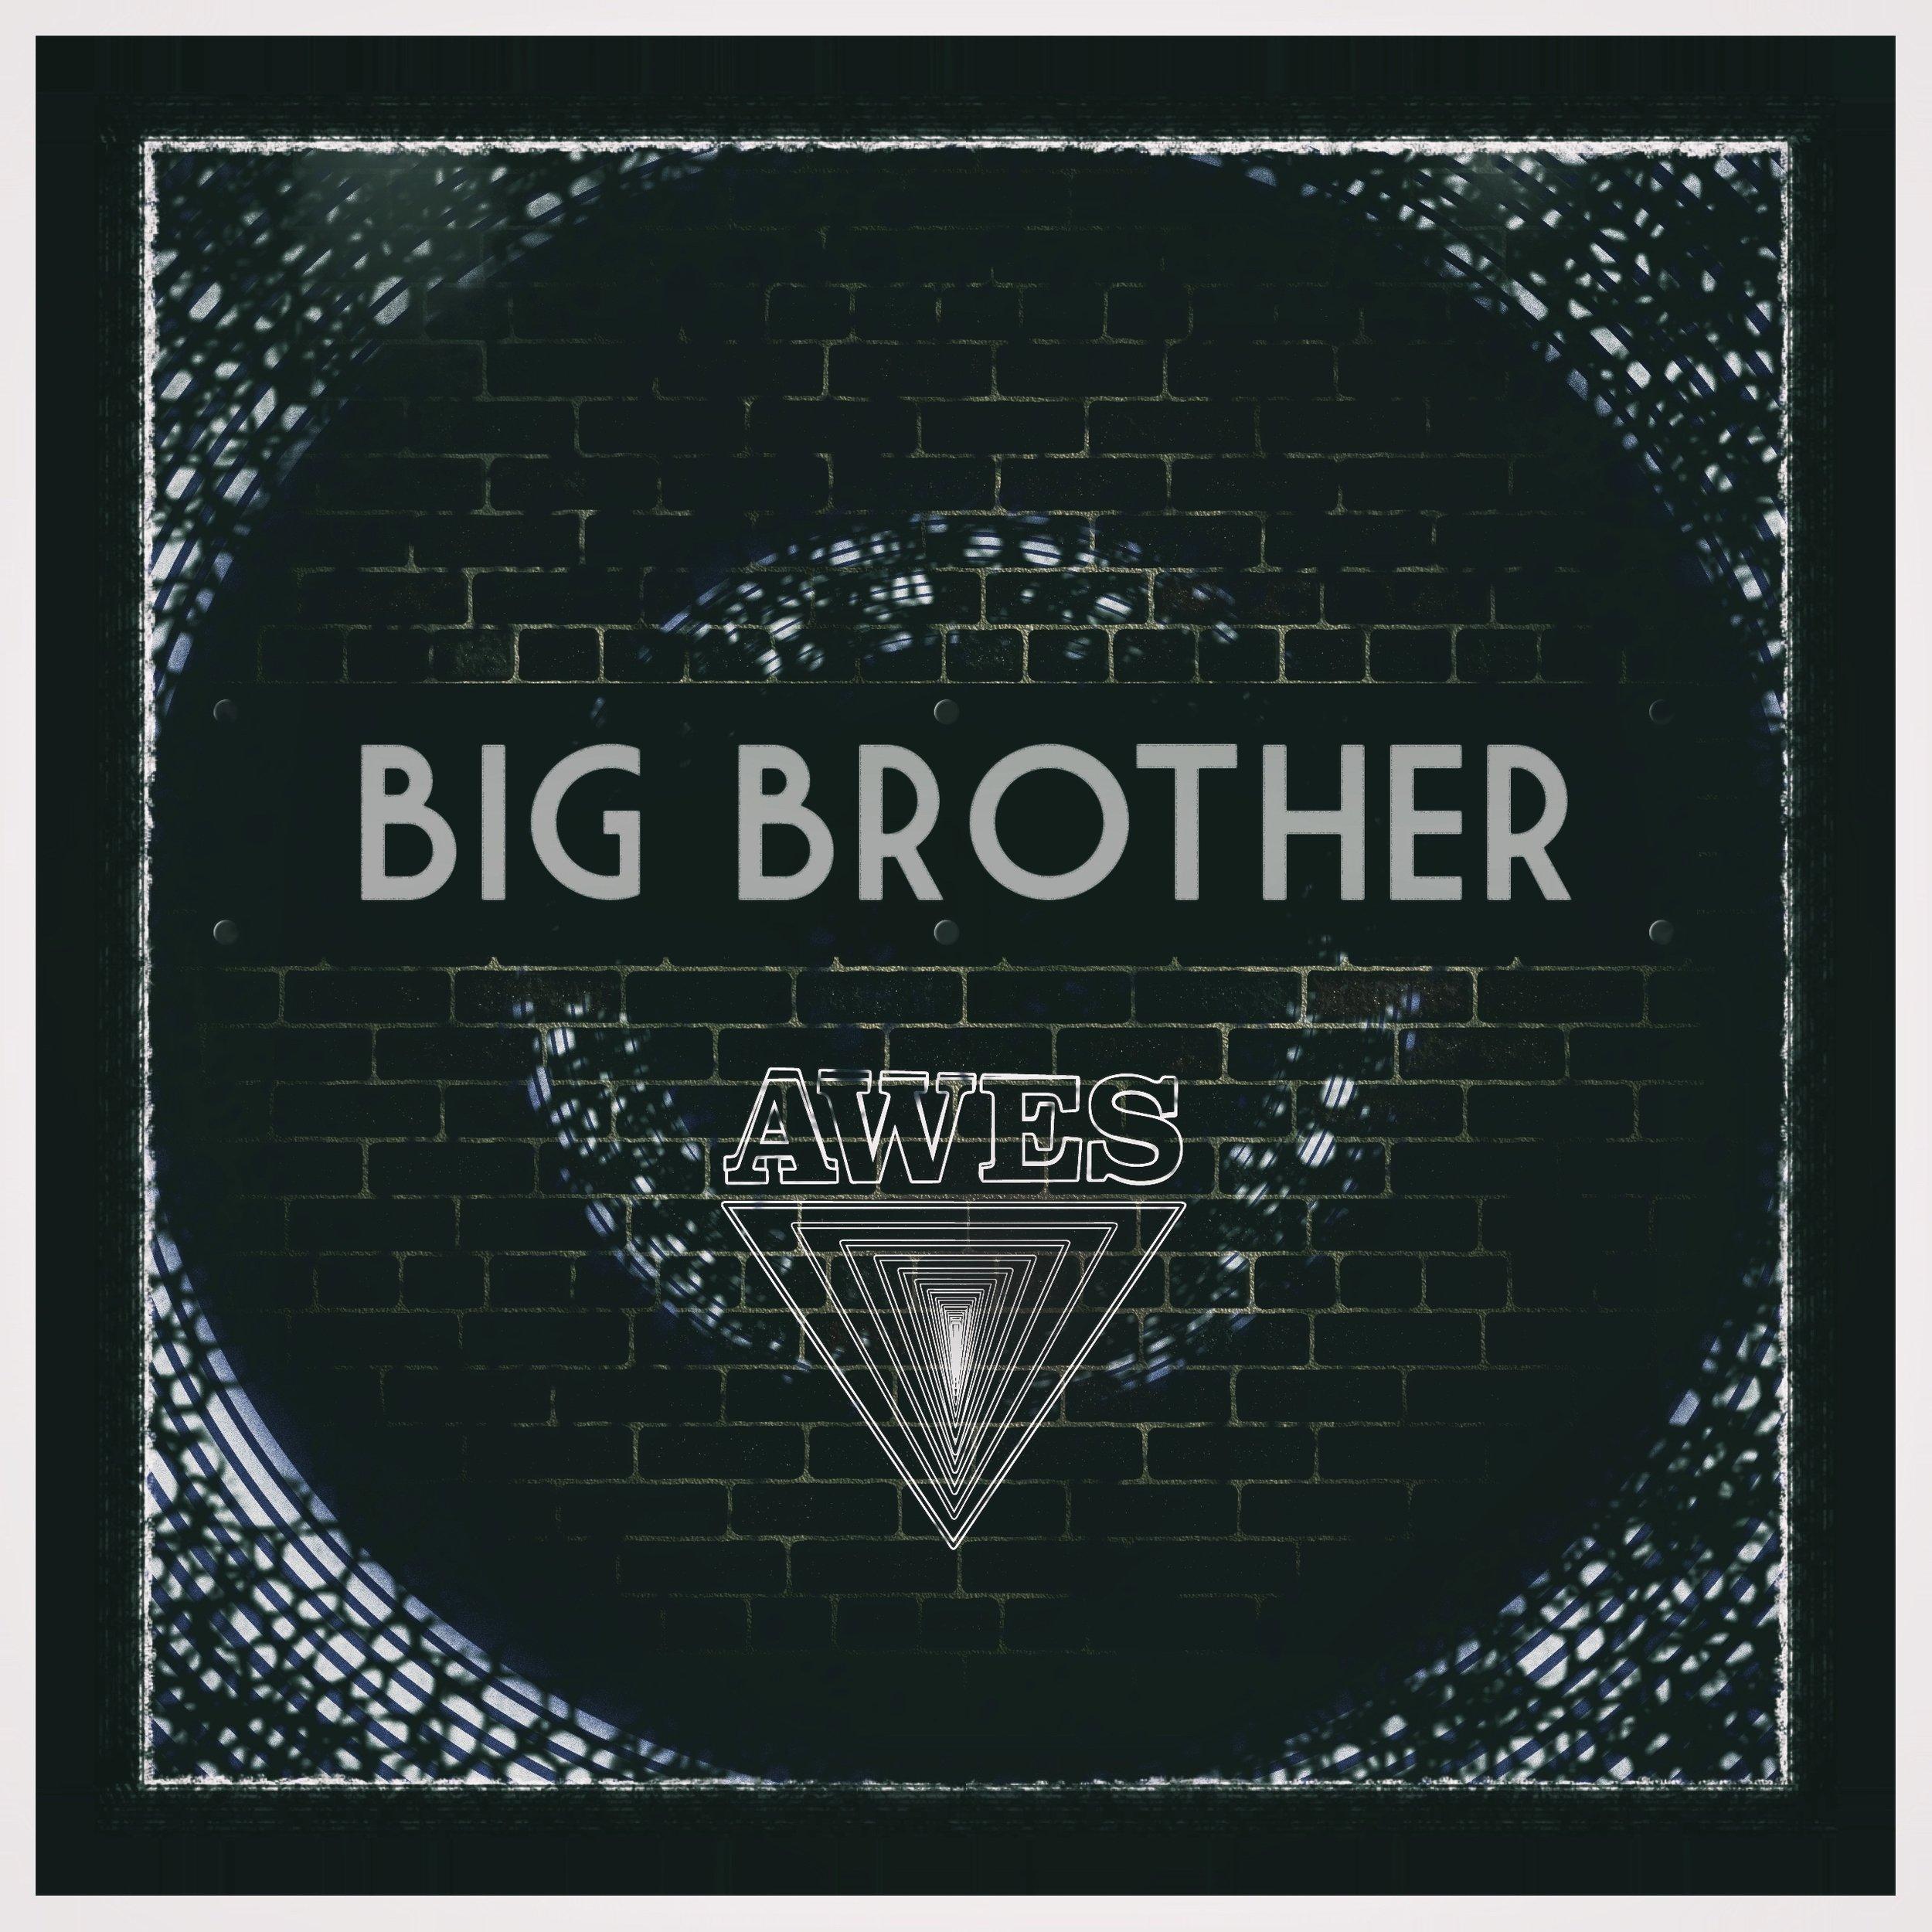 Big Brother Album Cover.jpg